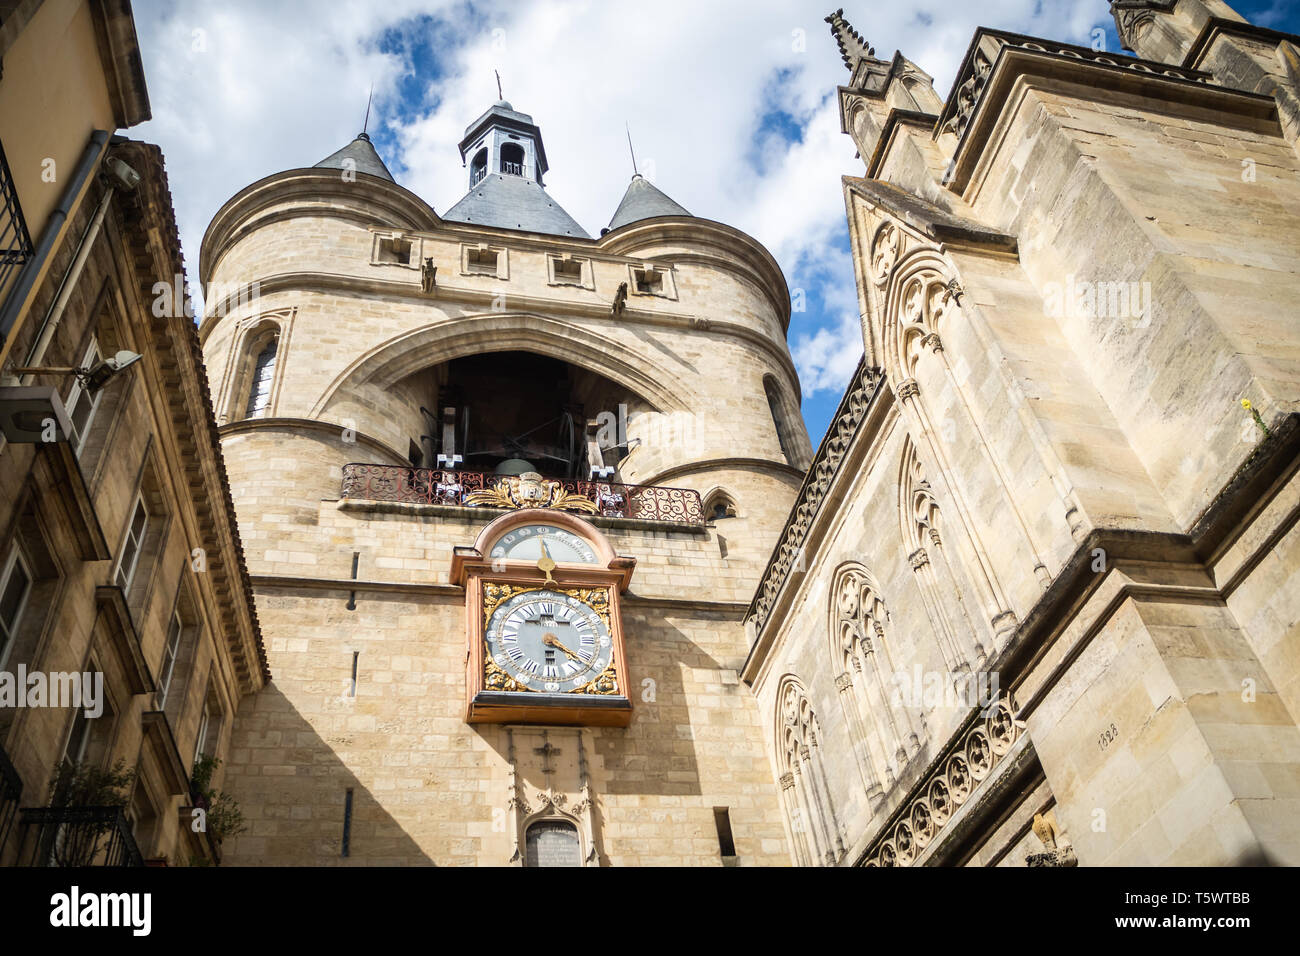 Parish Church of Saint Eloi Saint James Street in Bordeaux - Stock Image